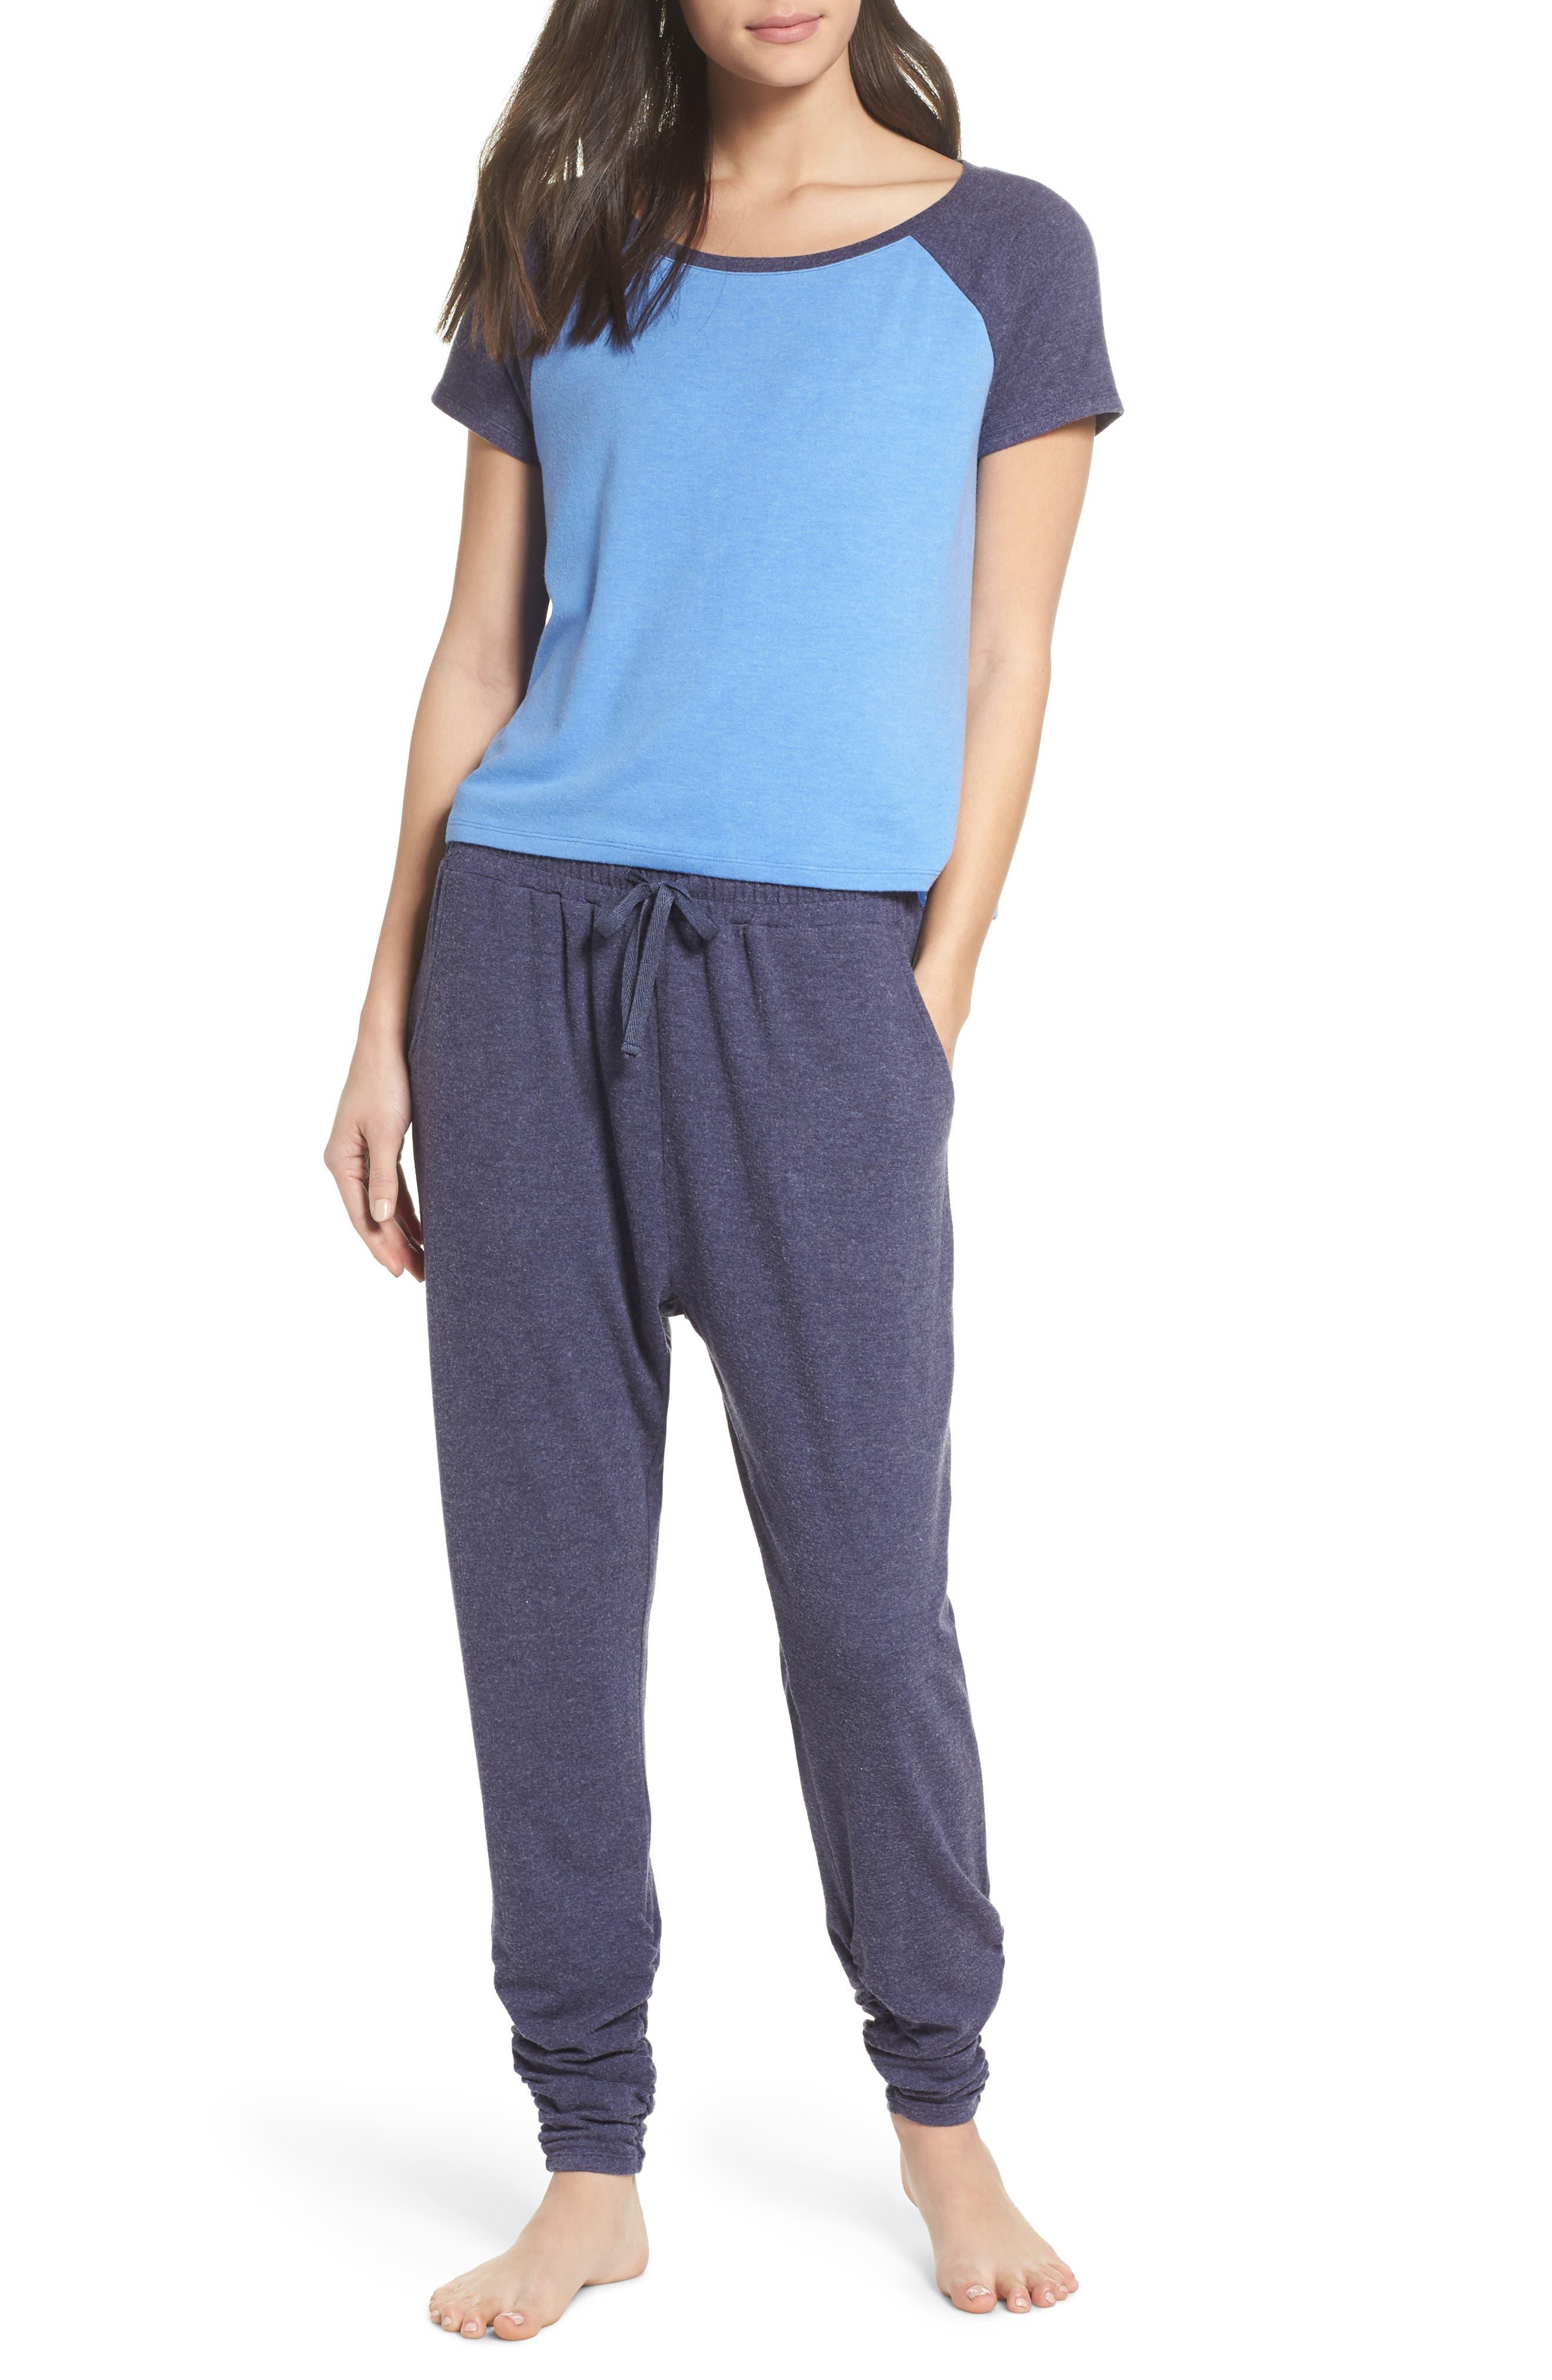 Cloud 9 Pajamas,                             Main thumbnail 1, color,                             Blue Azurite